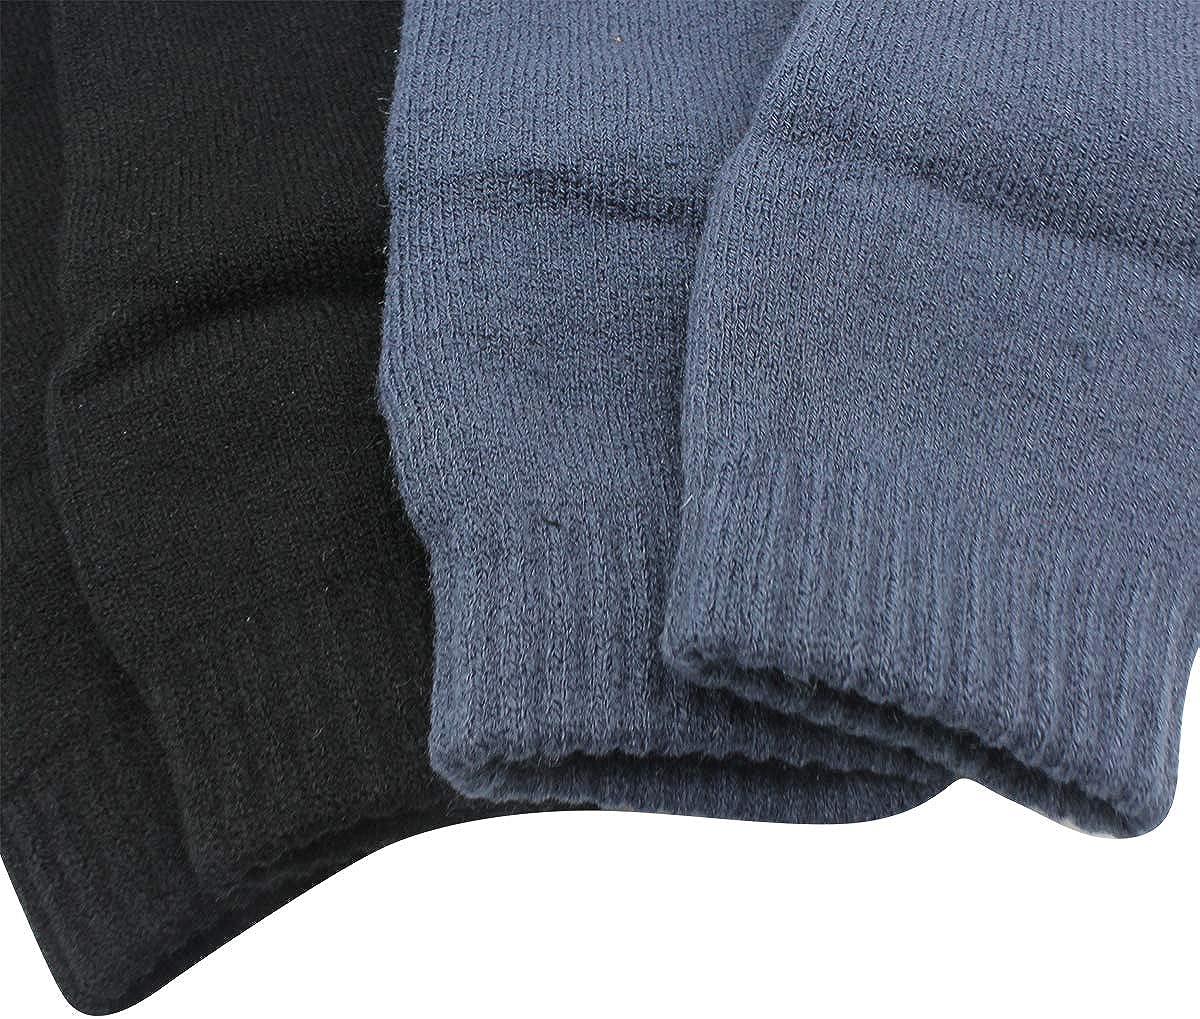 Aibearty 2 Pairs Yoga Sport Gym Five Toe Separator Socks Foot Alignment Pain Massage Socks,Prevent Foot Cramps